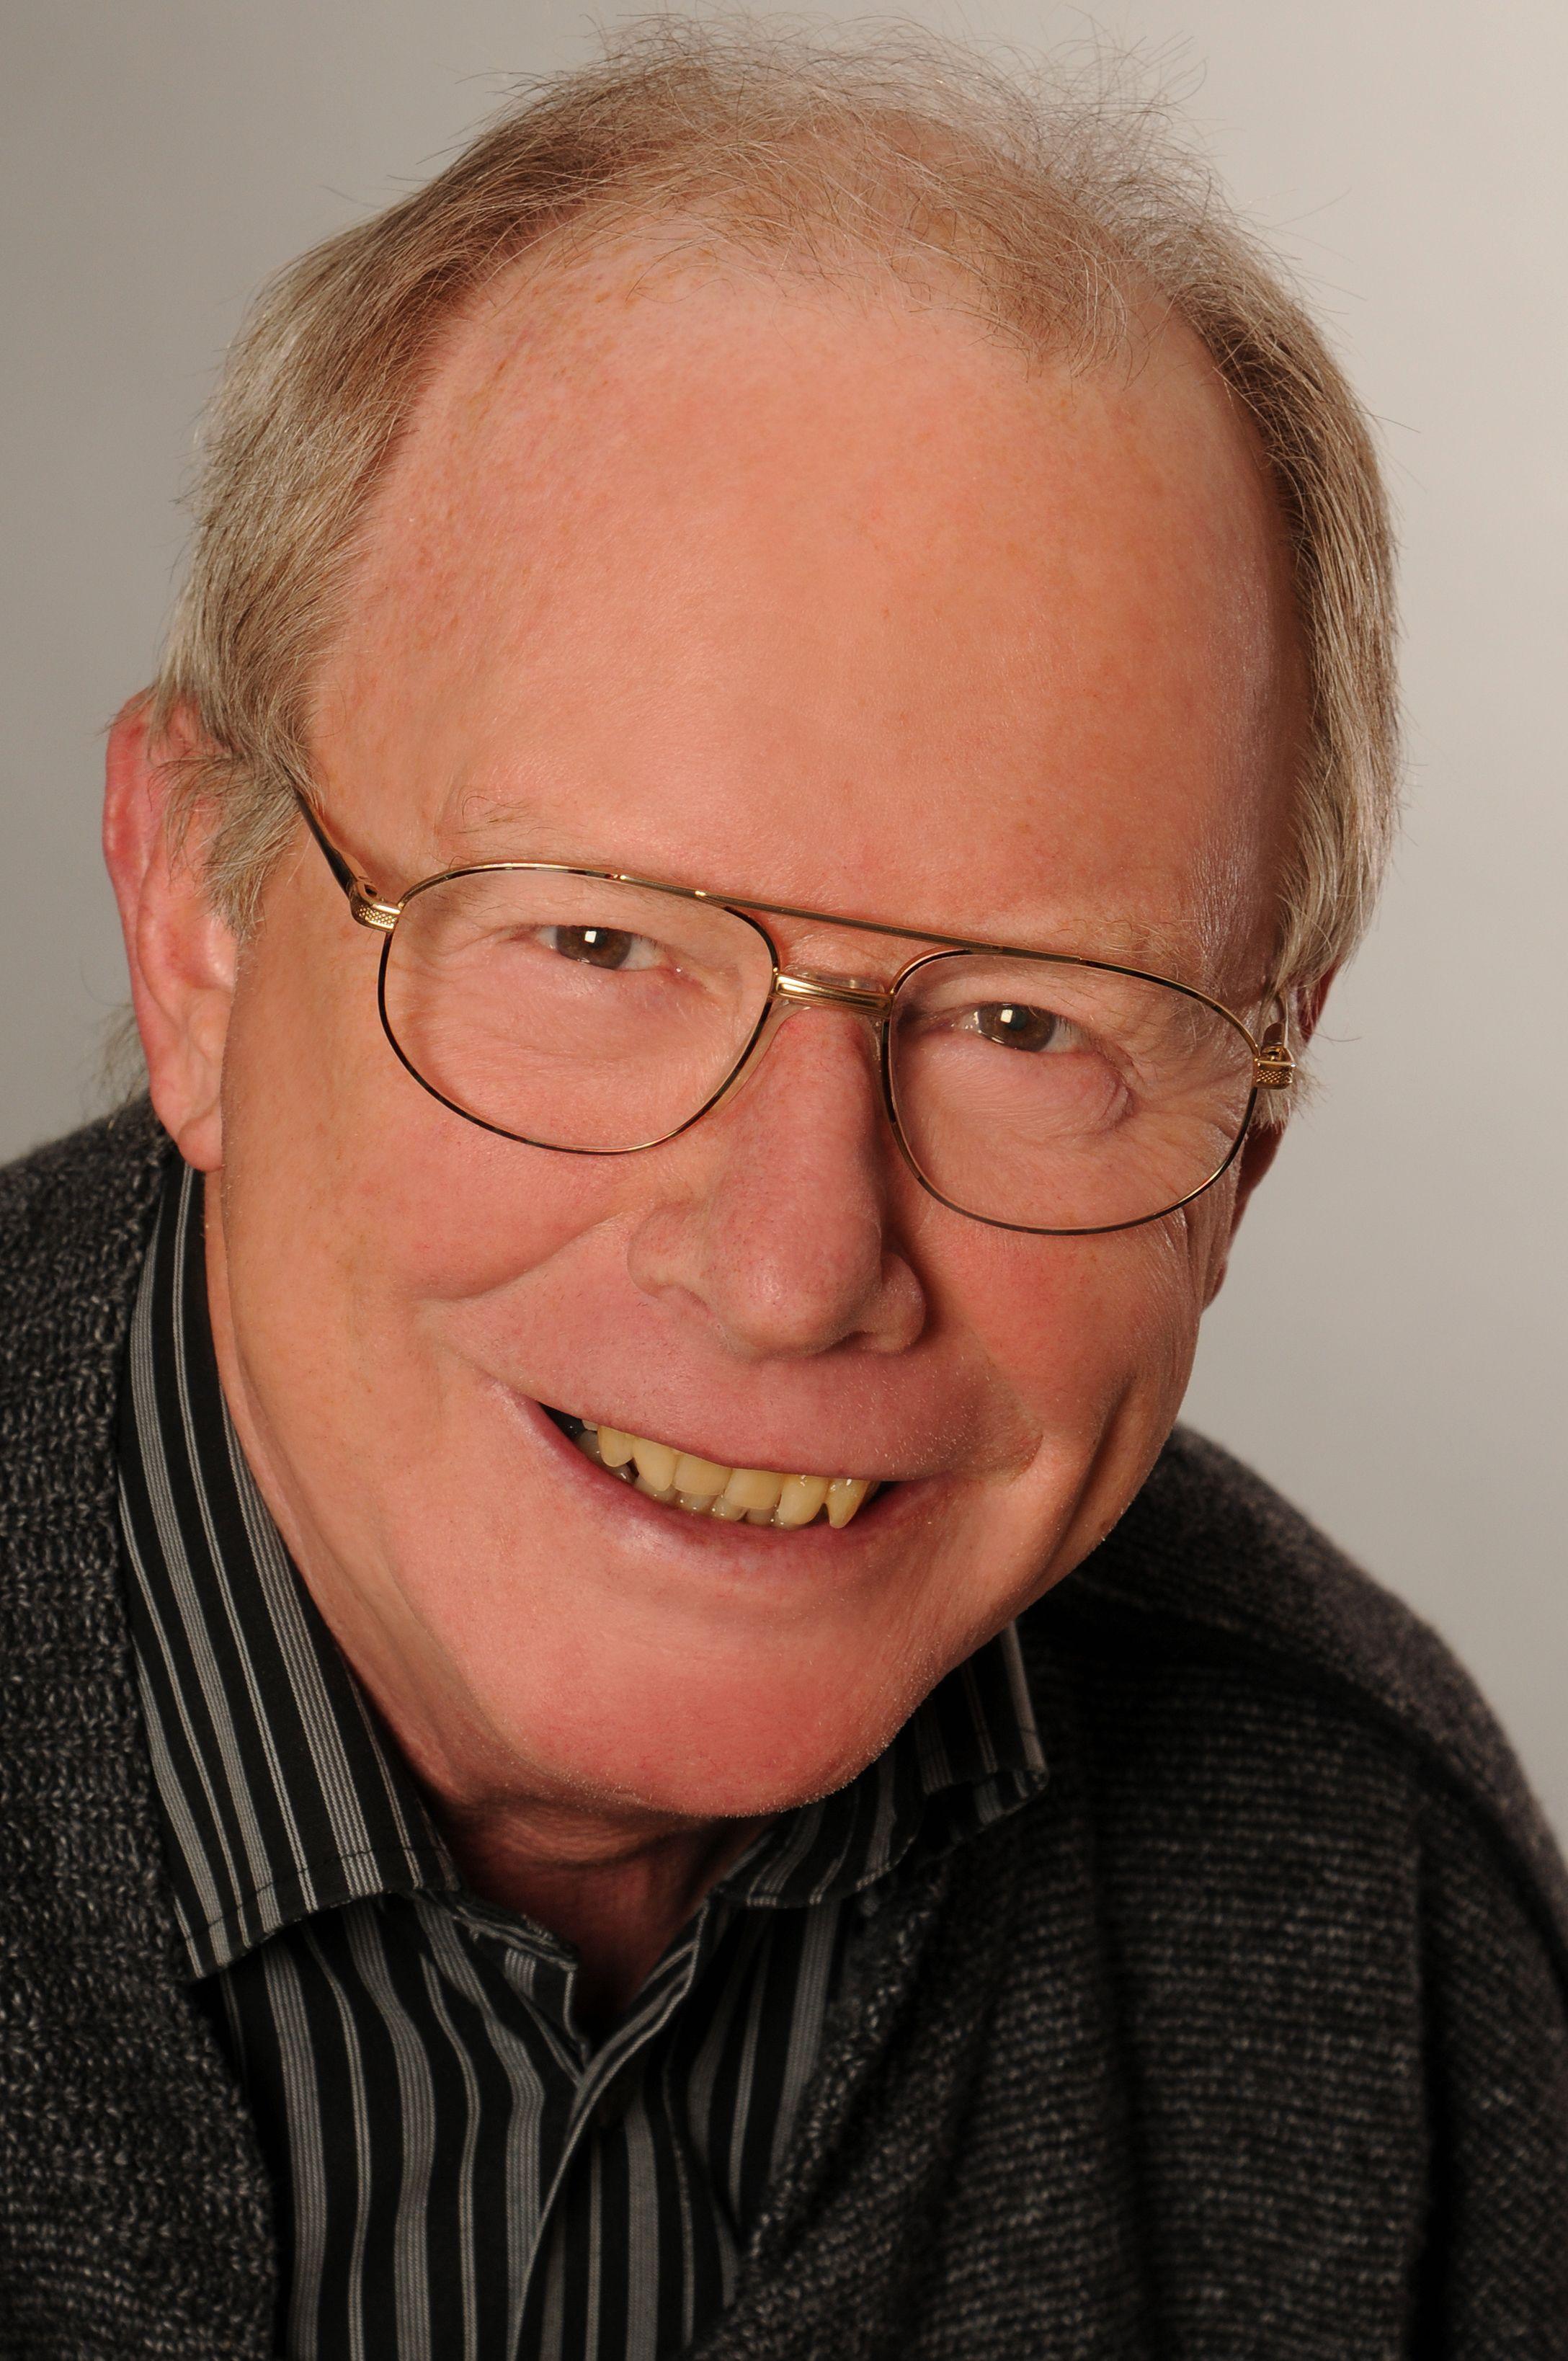 <b>Konrad Lengers</b>, Rosendahl, Justizamtsinspektor. Amtsgericht Coesfeld - Georg_Galle_2015